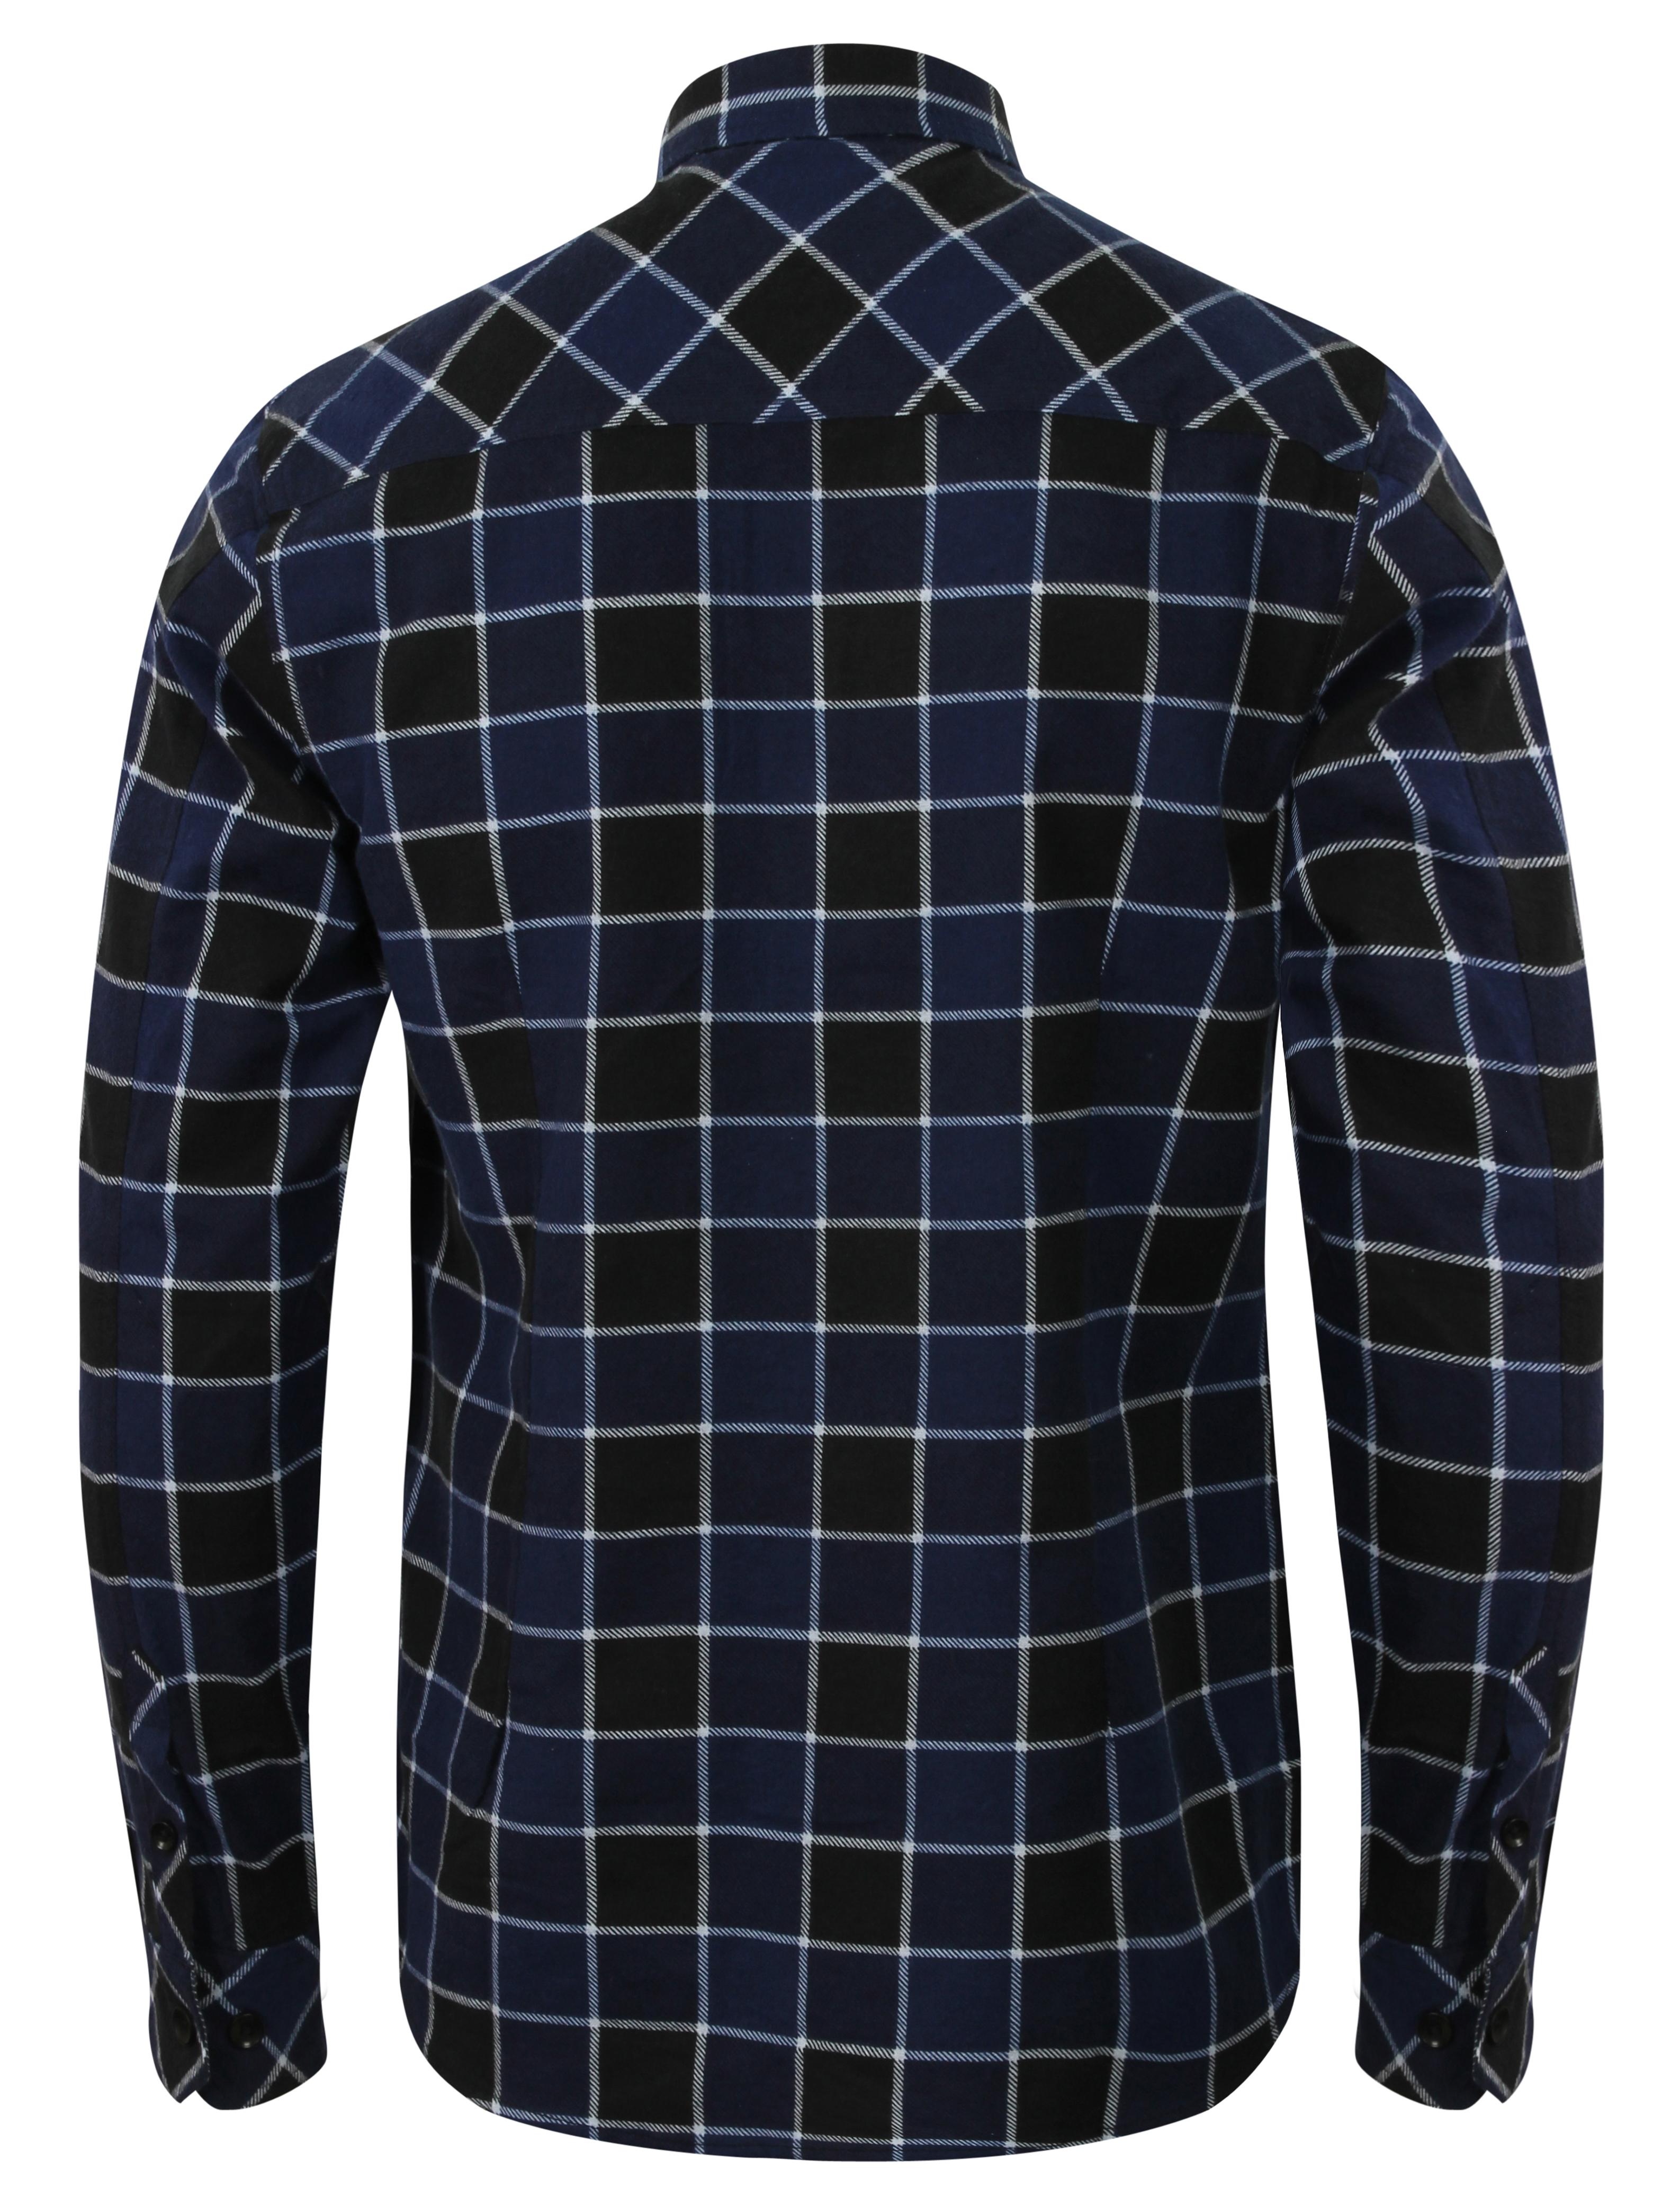 Mens-Shirt-Tokyo-Laundry-Tartan-Check-Flannel-Top-Collared-Long-Sleeved-Casual thumbnail 3